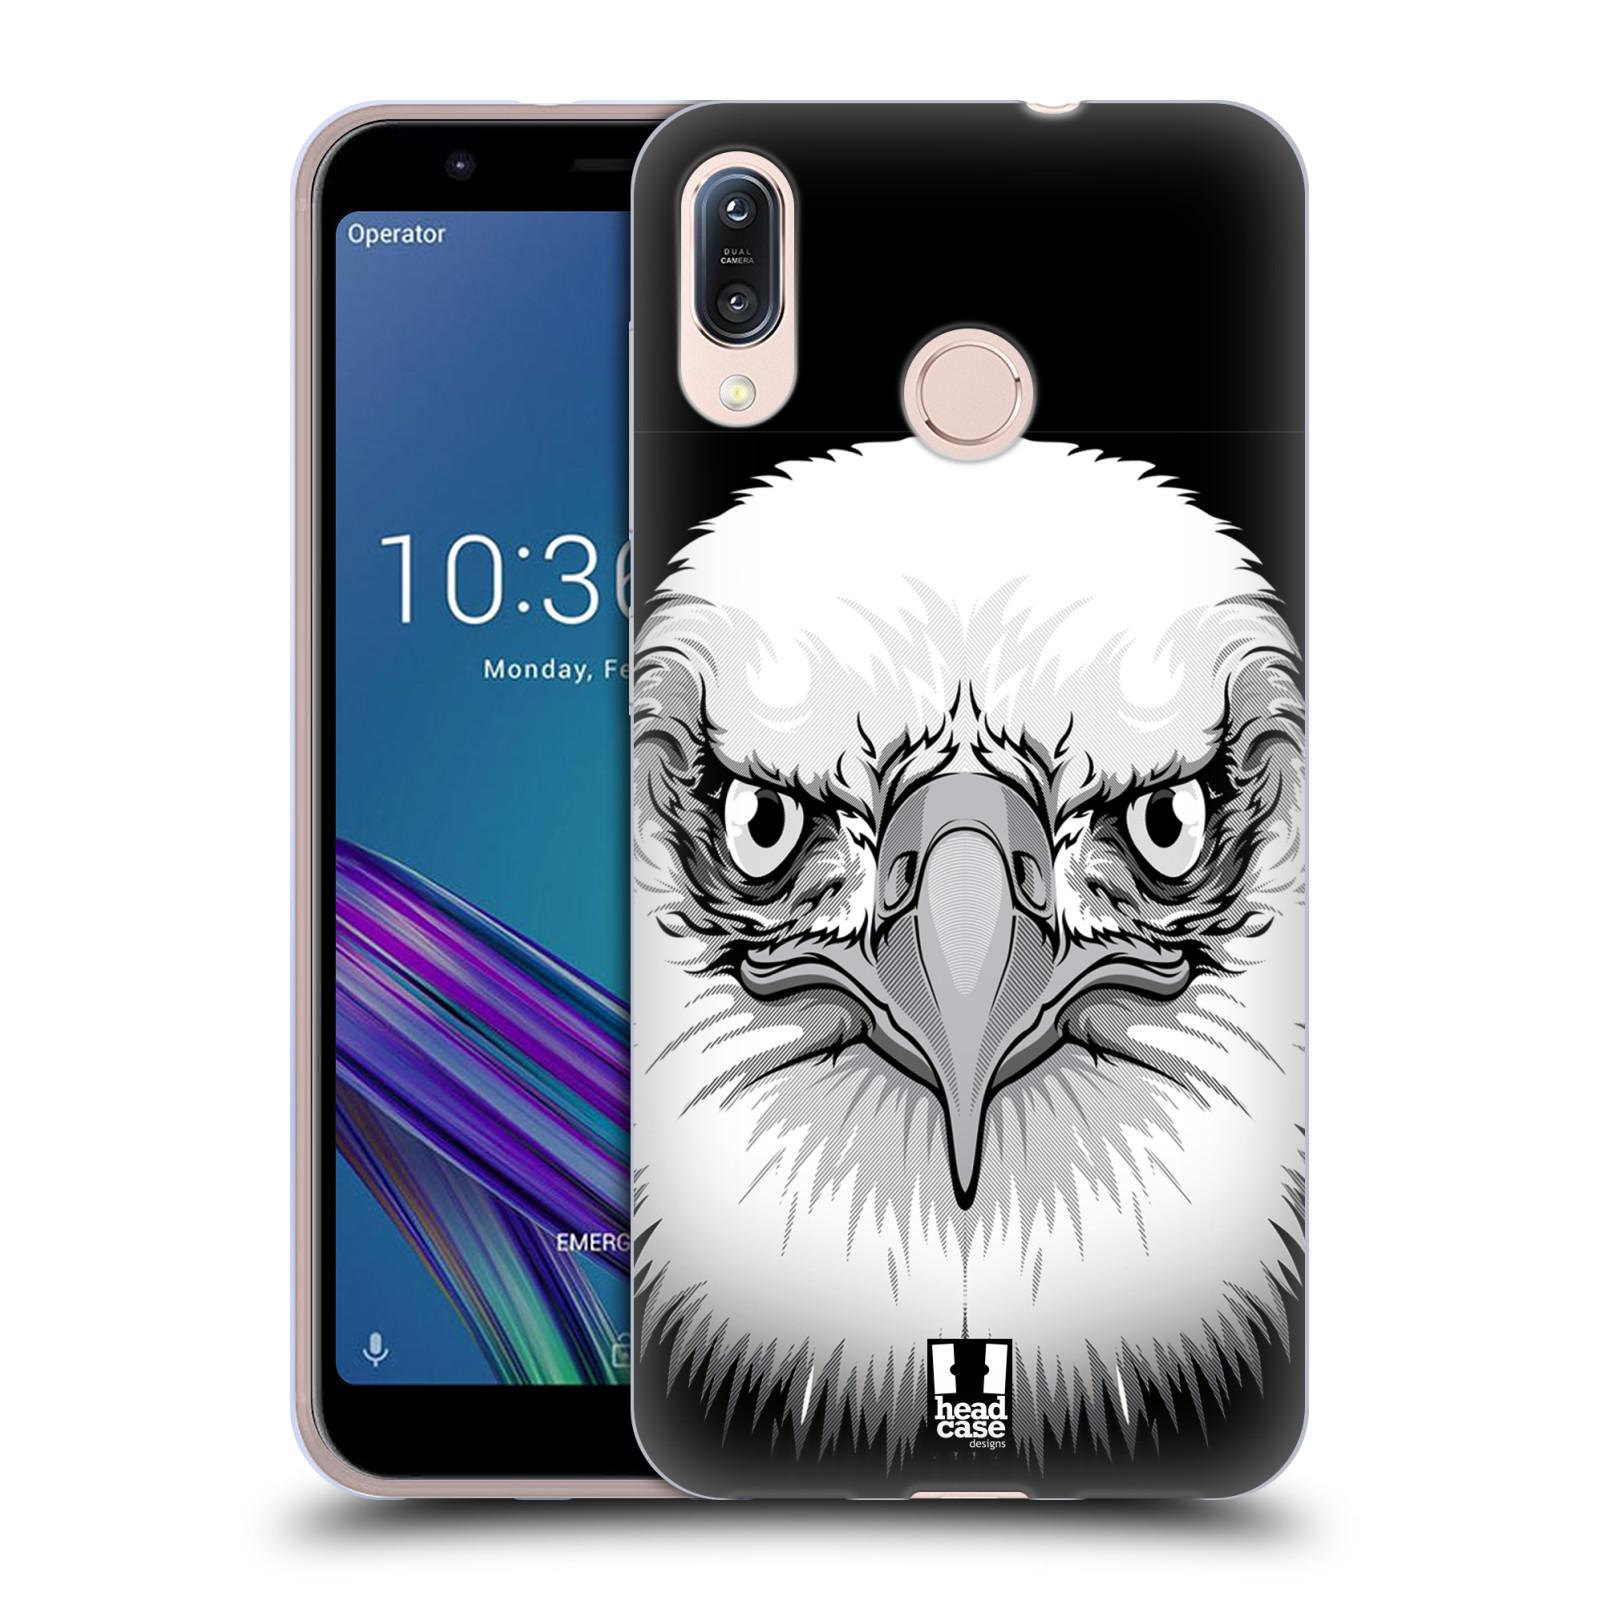 Silikonové pouzdro na mobil Asus Zenfone Max M1 ZB555KL - Head Case - ILUSTROVANÝ OREL